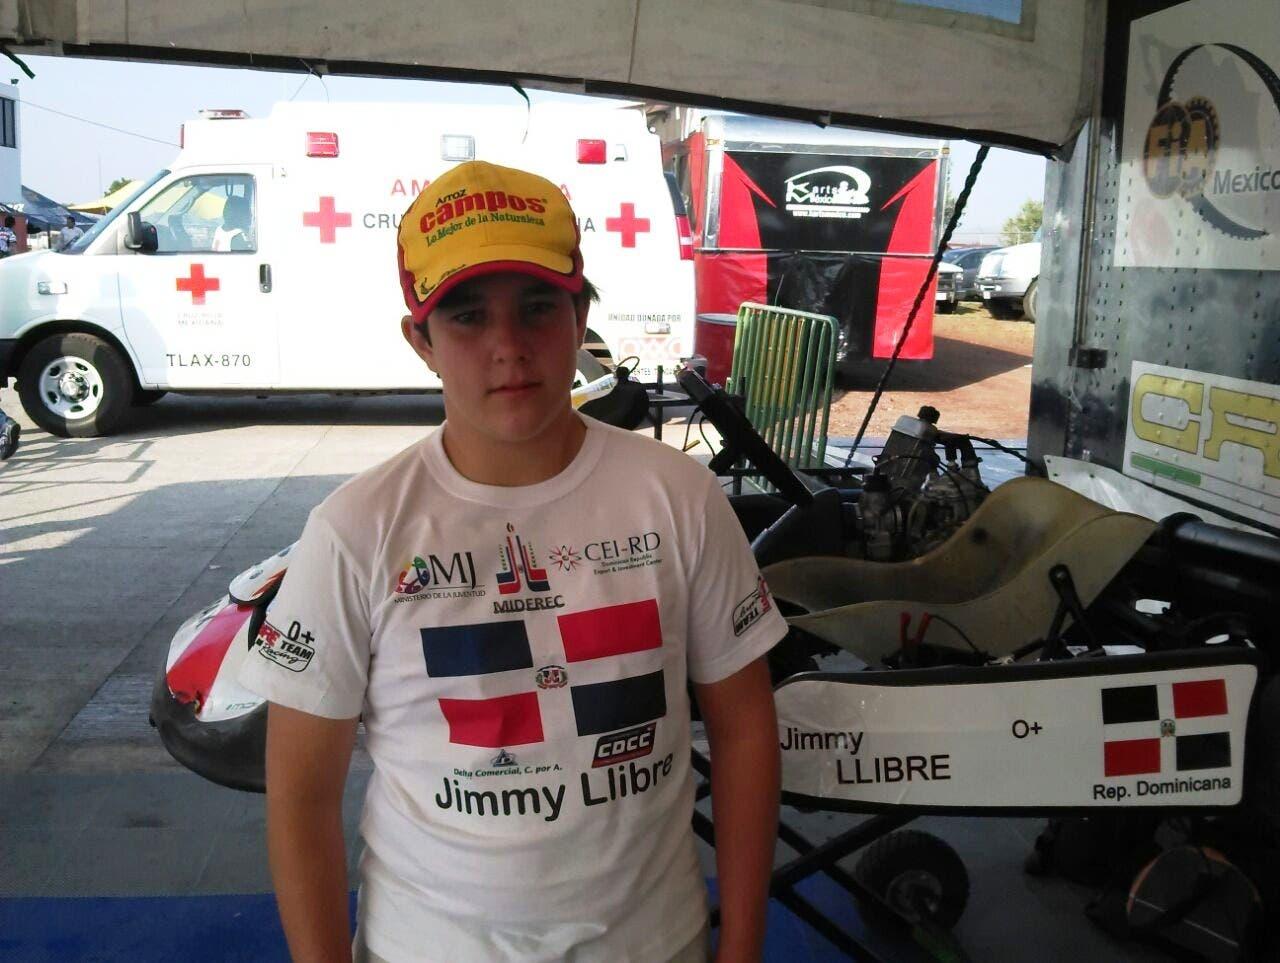 Jimmy Llibre Jr. competirá en el Campeonato Fórmula 4 de Argentina.